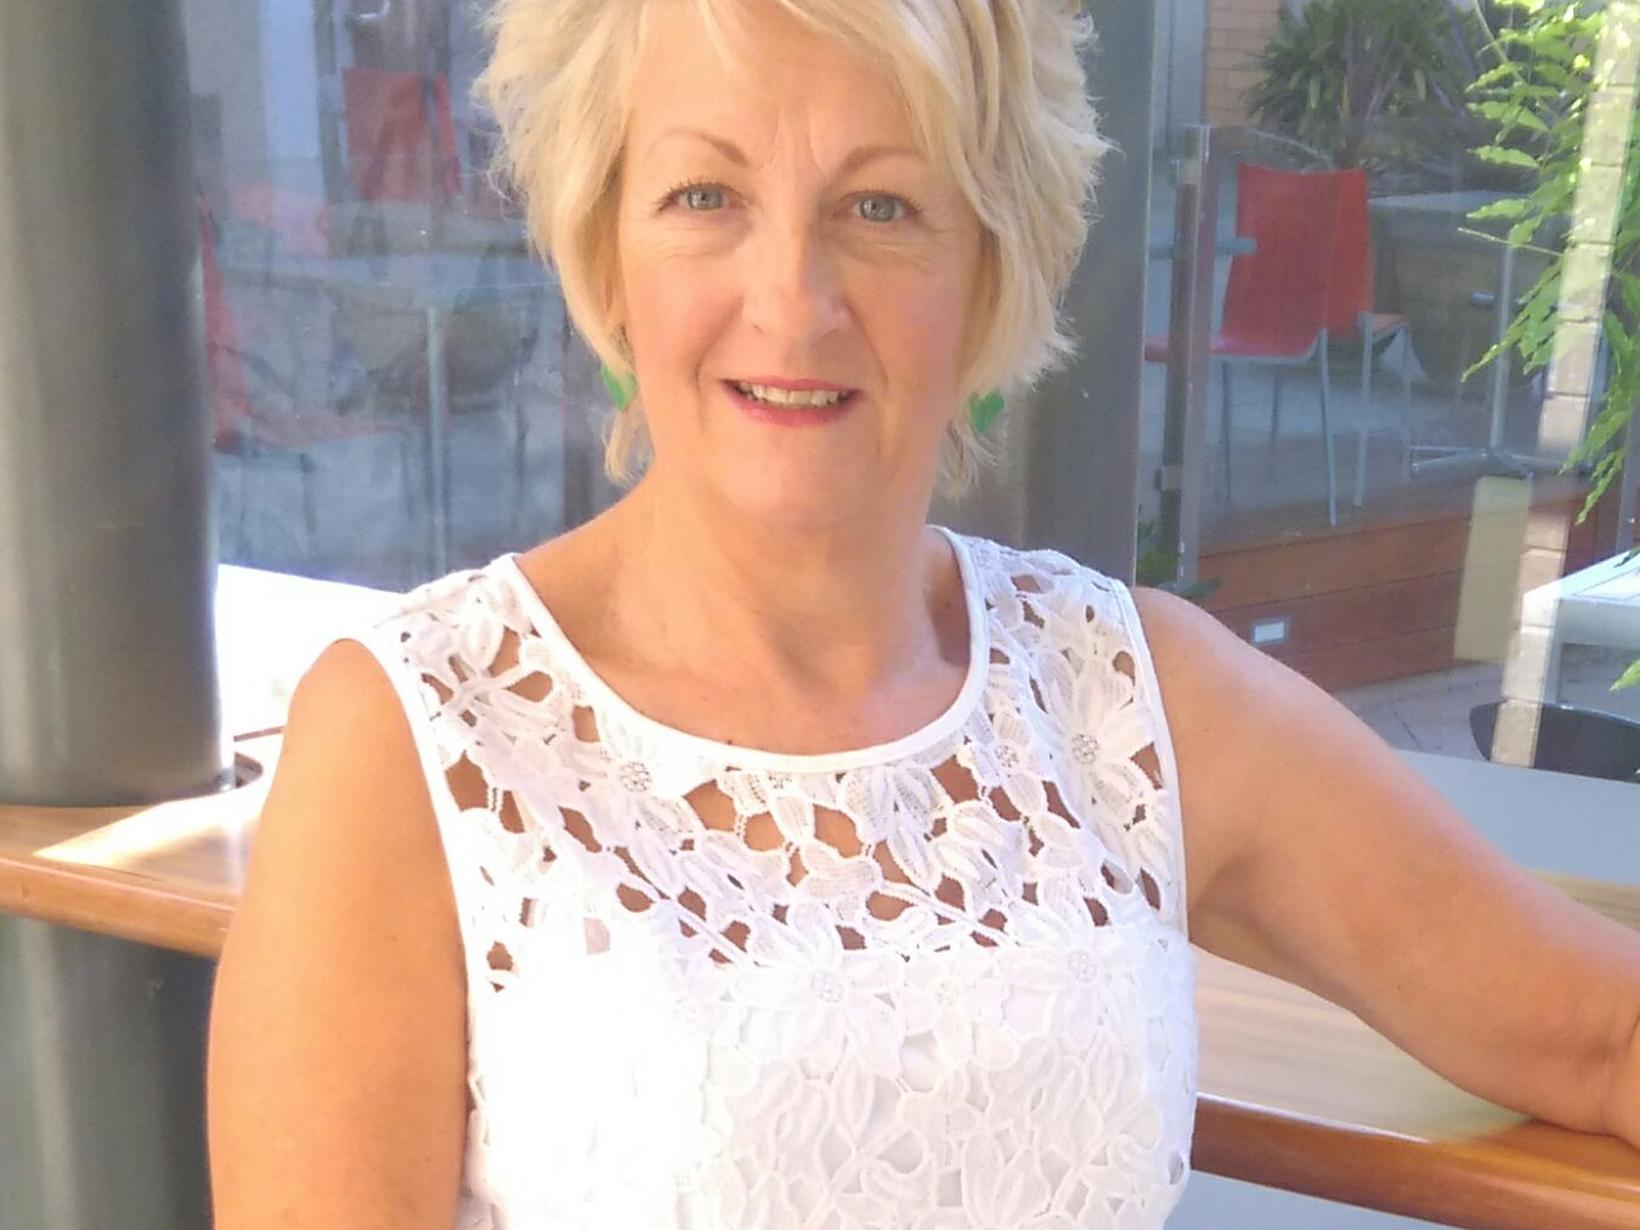 Gillian from Sydney, New South Wales, Australia